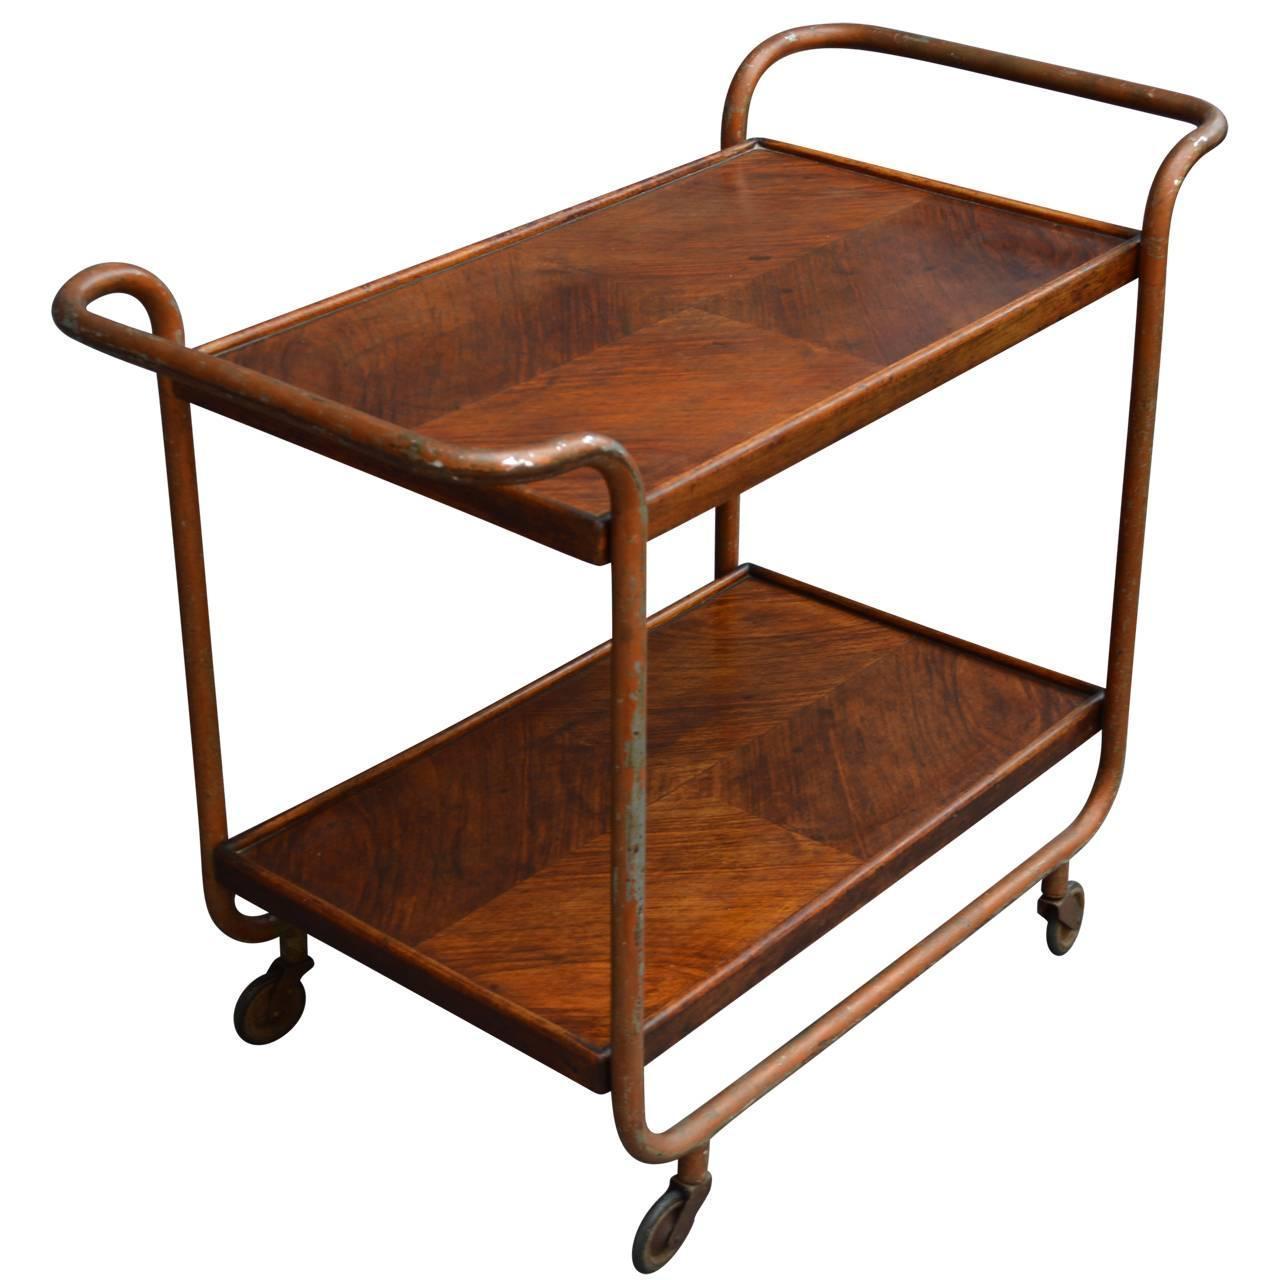 vintage italian mid century bar cart at 1stdibs. Black Bedroom Furniture Sets. Home Design Ideas